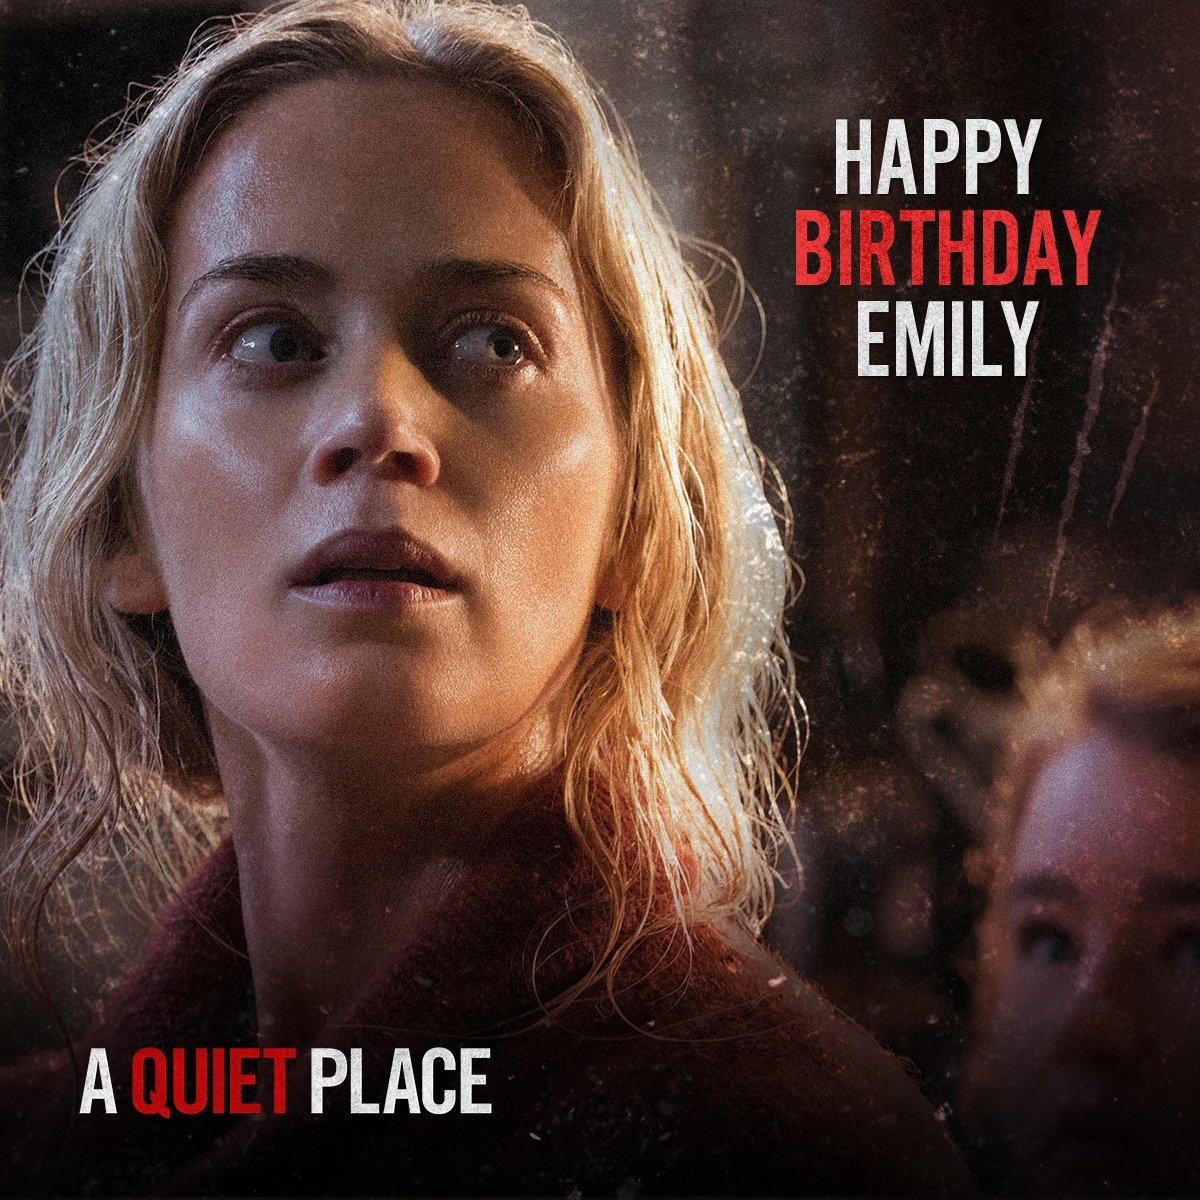 Happy Birthday Emily Blunt! Best to keep the celebrations quiet...